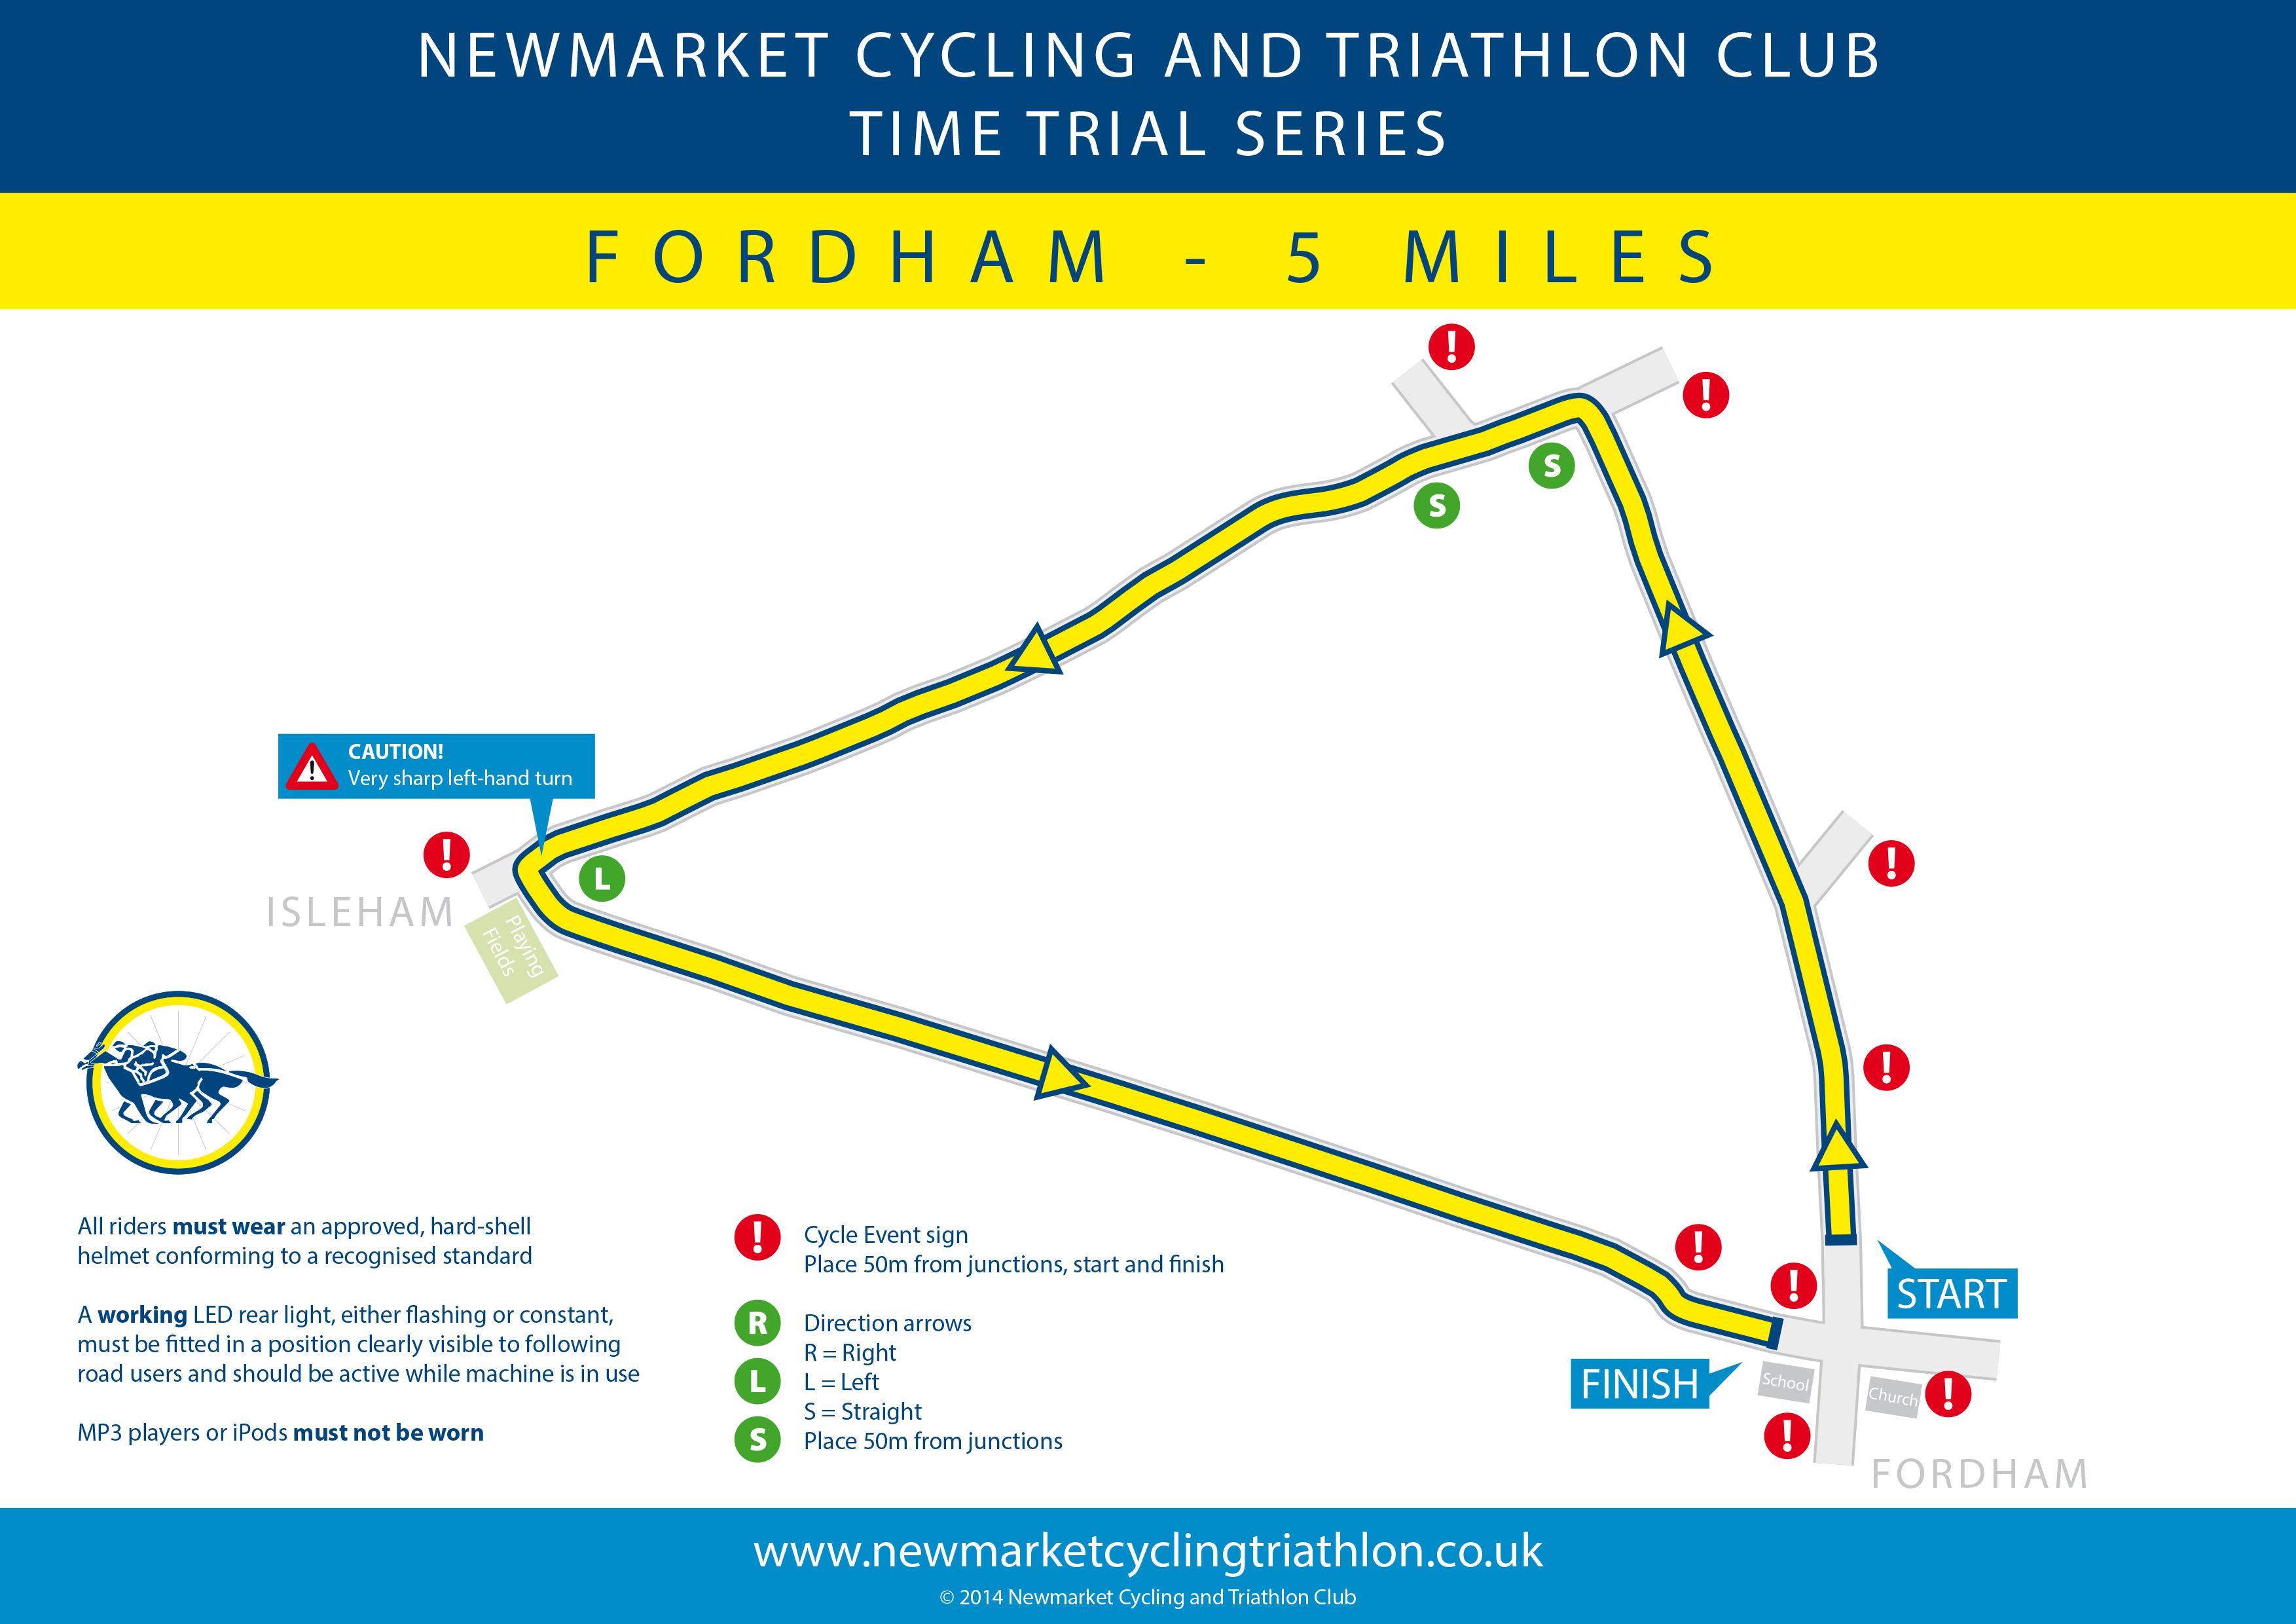 NCTC Fordham TT route